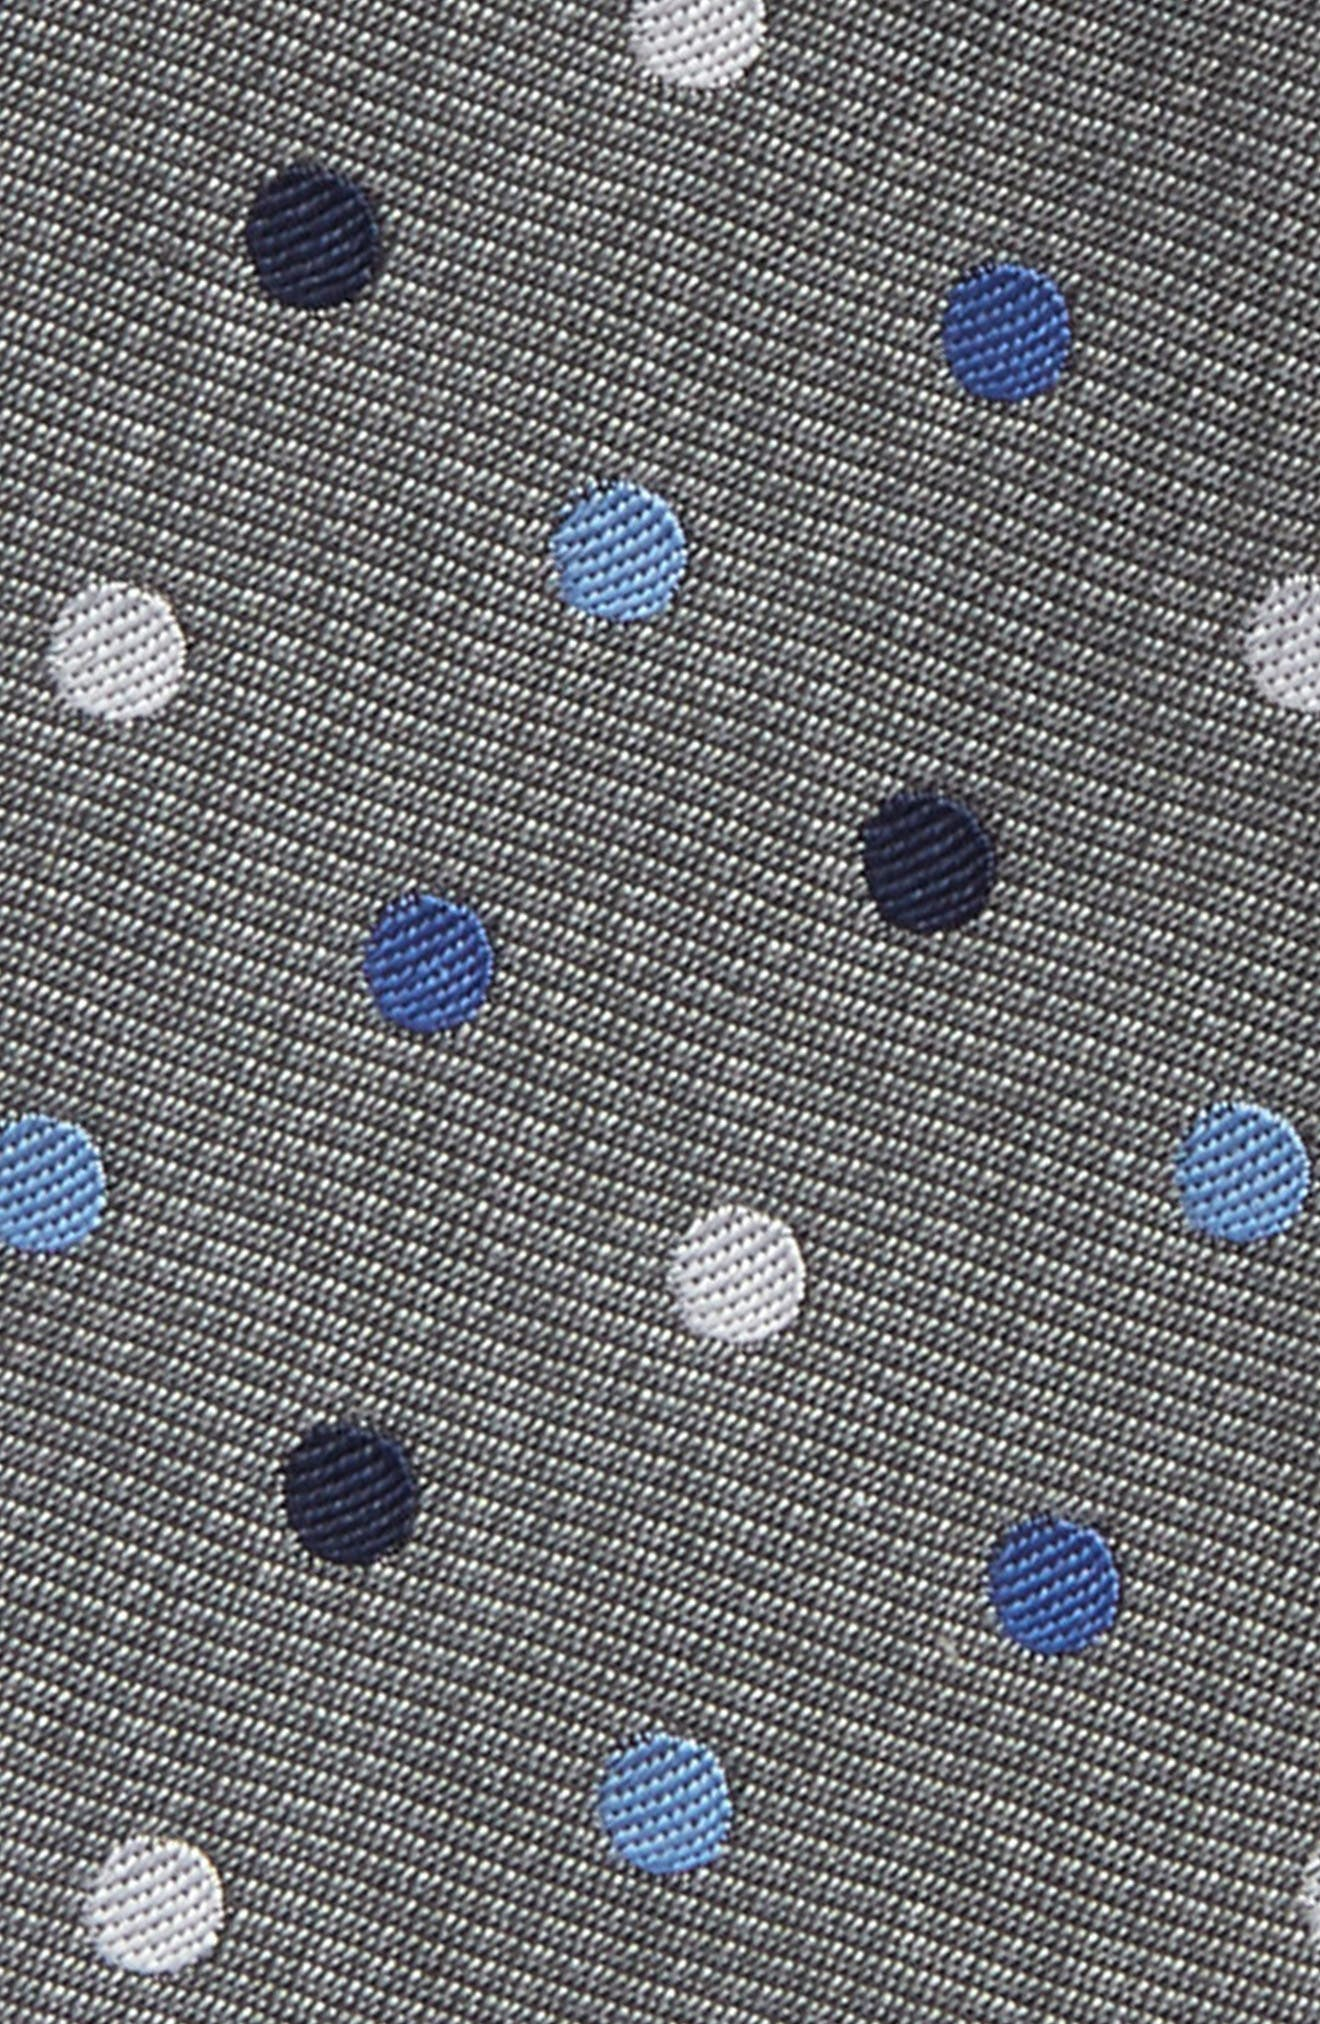 Spree Dot Silk Bow Tie,                             Alternate thumbnail 3, color,                             020